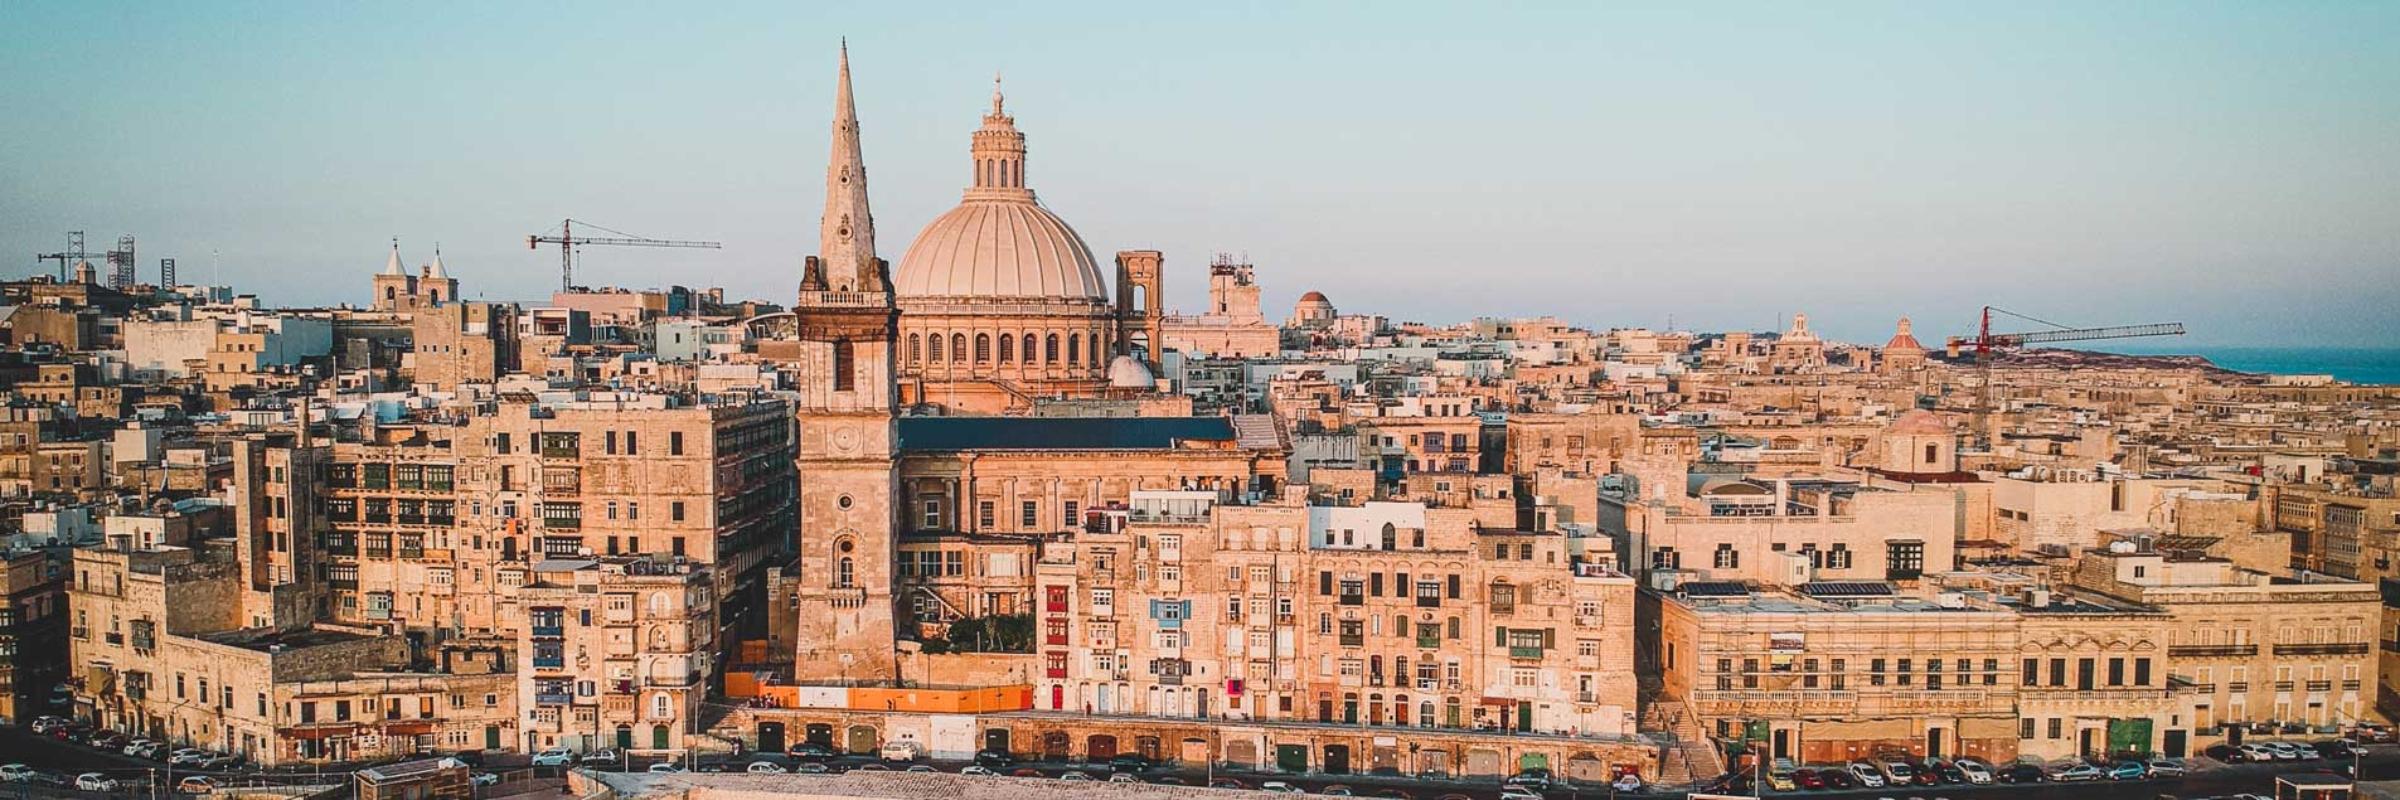 Top-10-fun-things-to-do-in-Malta-S